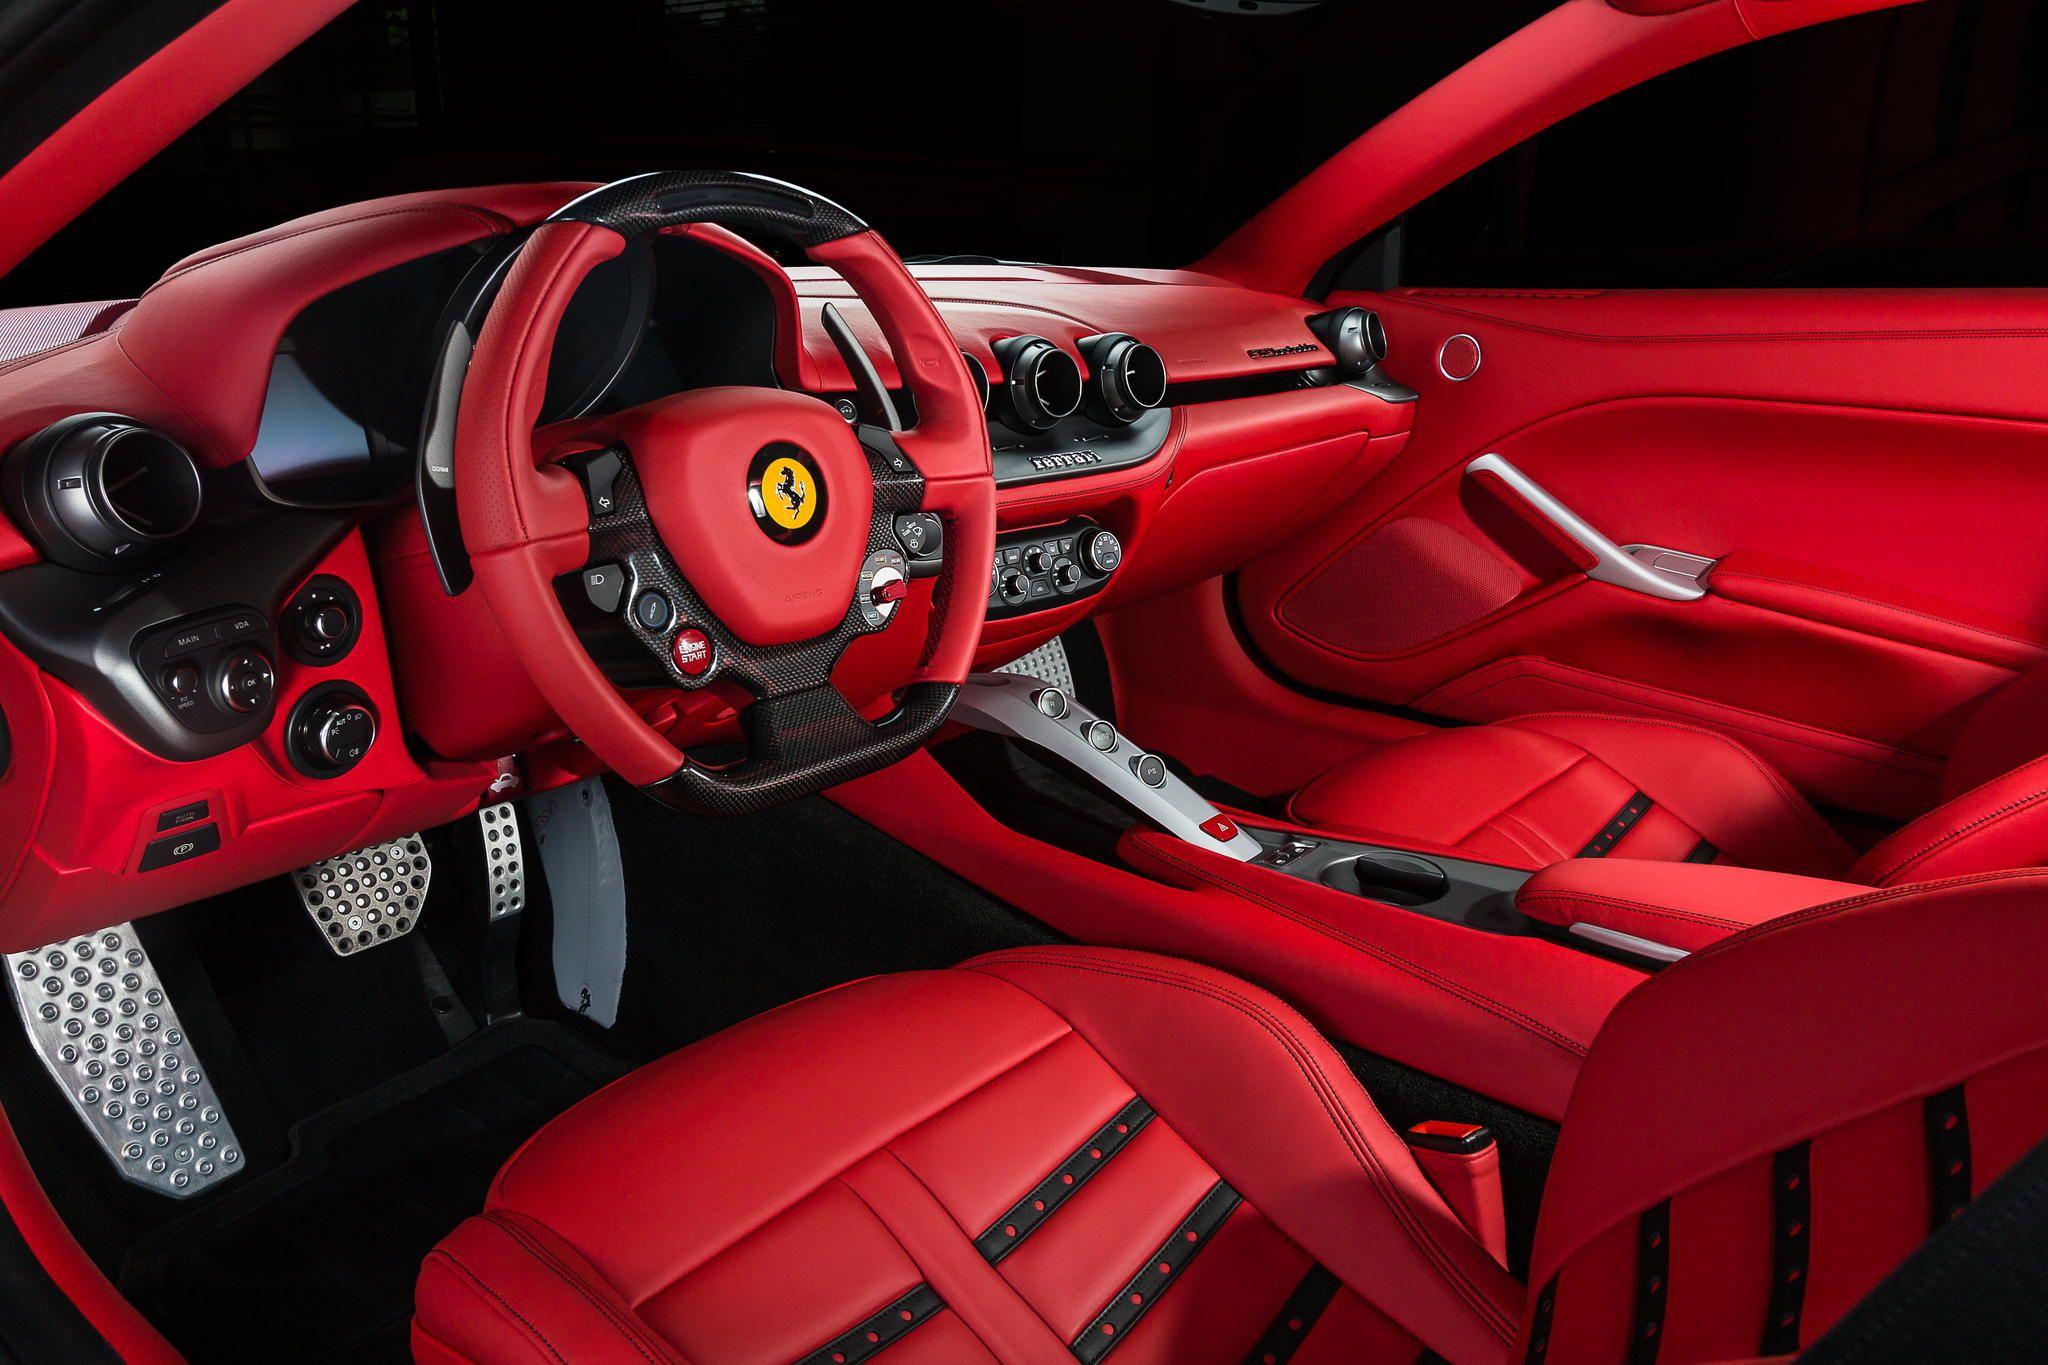 Photograph Ferrari F12berlinetta Interior By Hector Manon On 500px